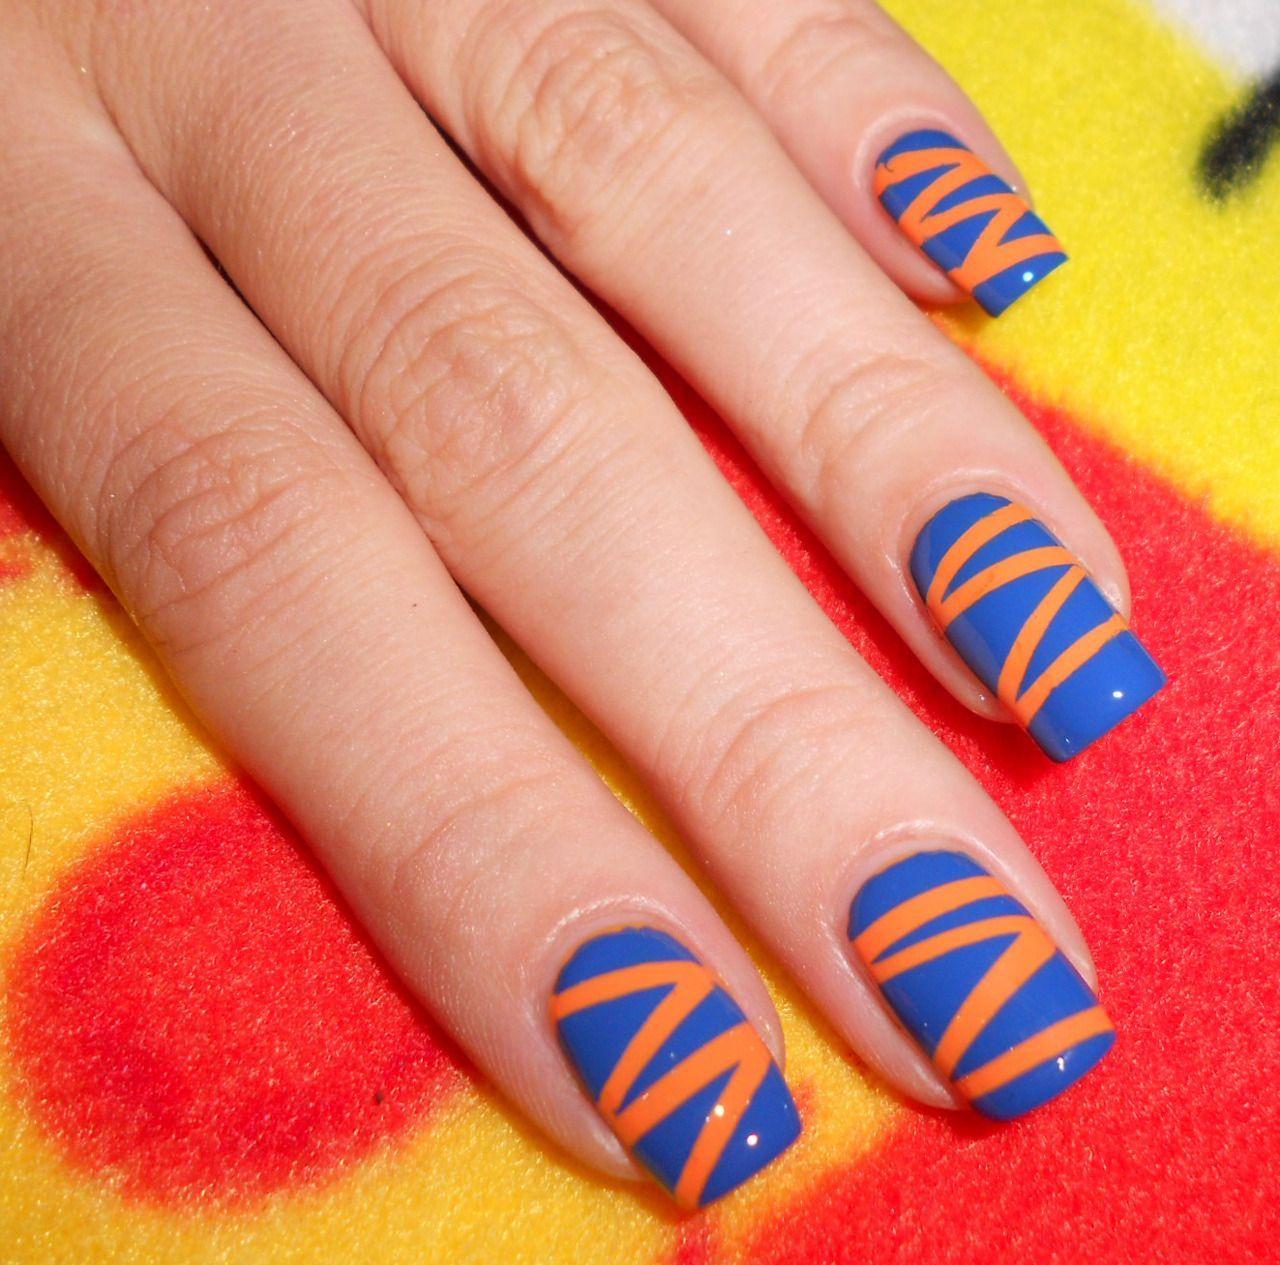 55 Stripe Nail Art Ideas With Images Manicure Paznokcie Paski